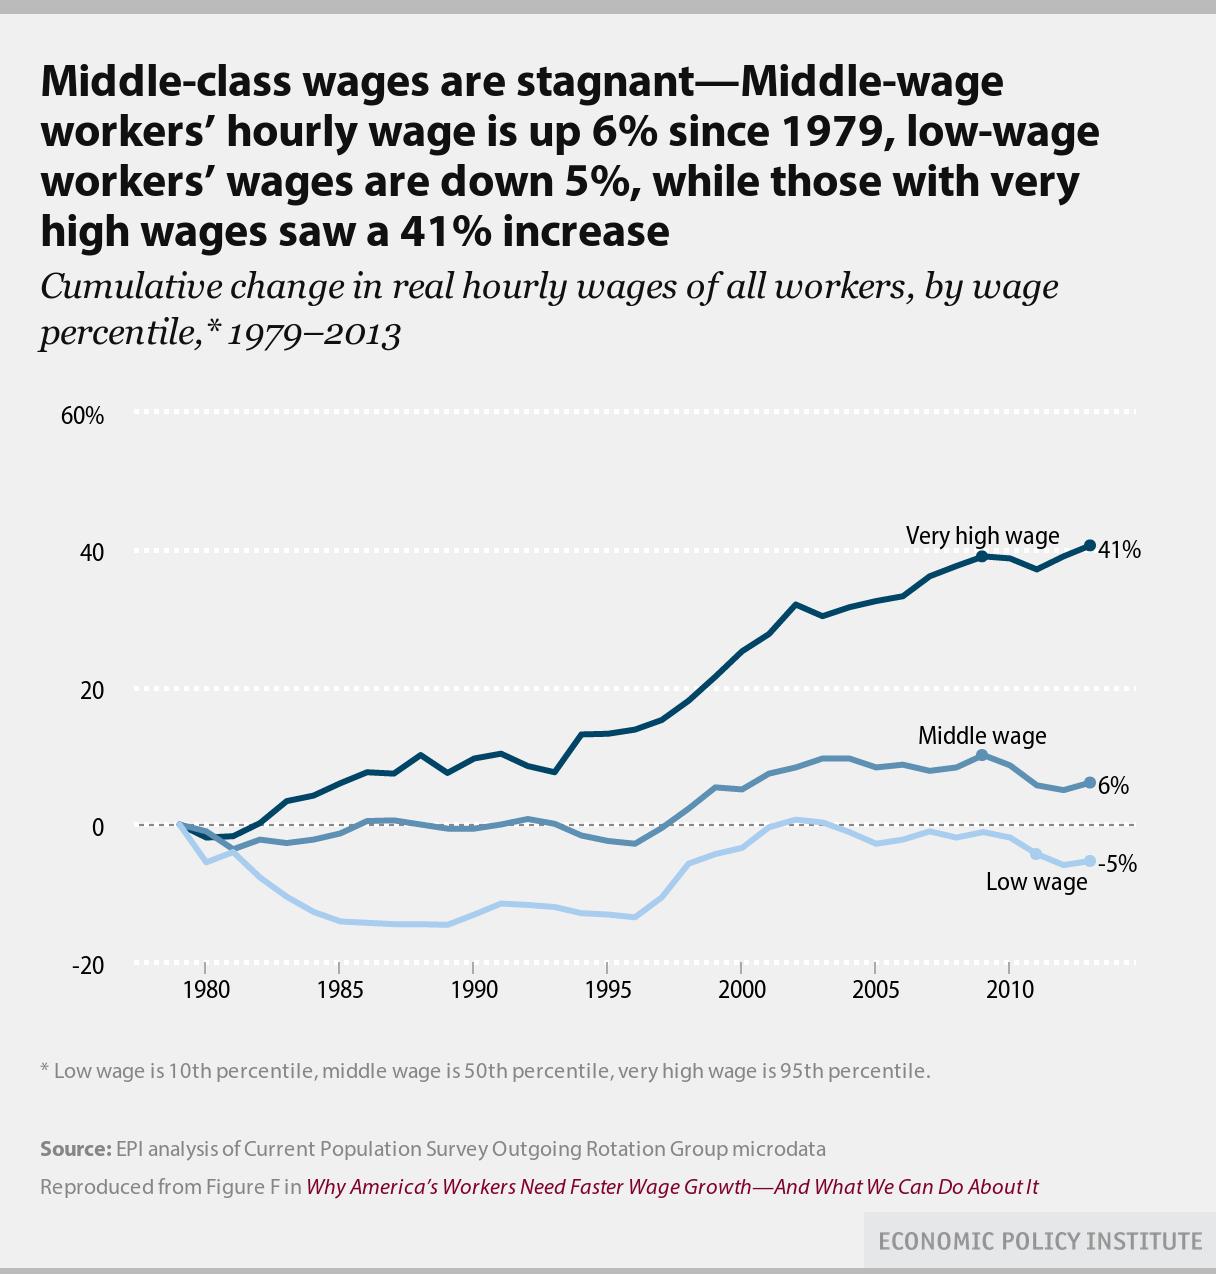 High_vs_low_wage